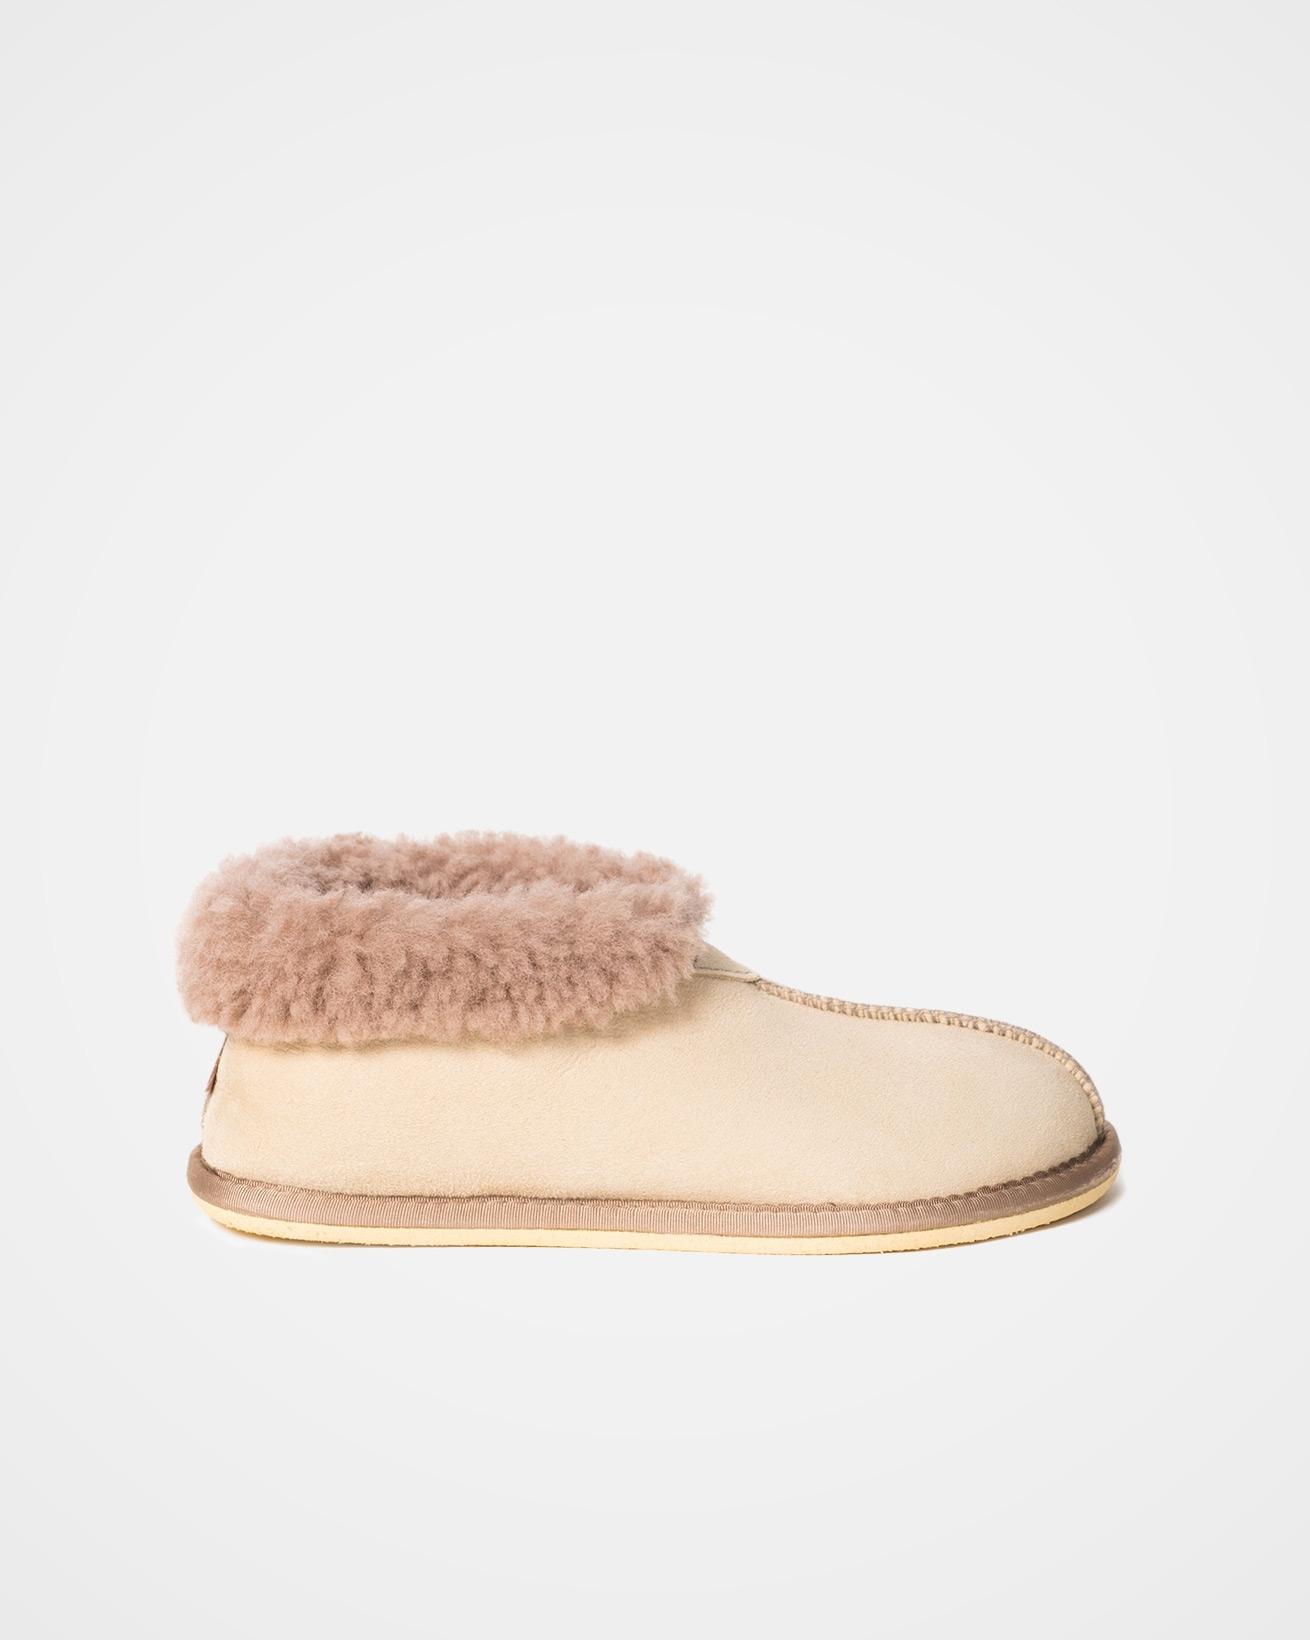 2100_ladies-sheepskin-bootee-slippers_oatmeal_outside.jpg